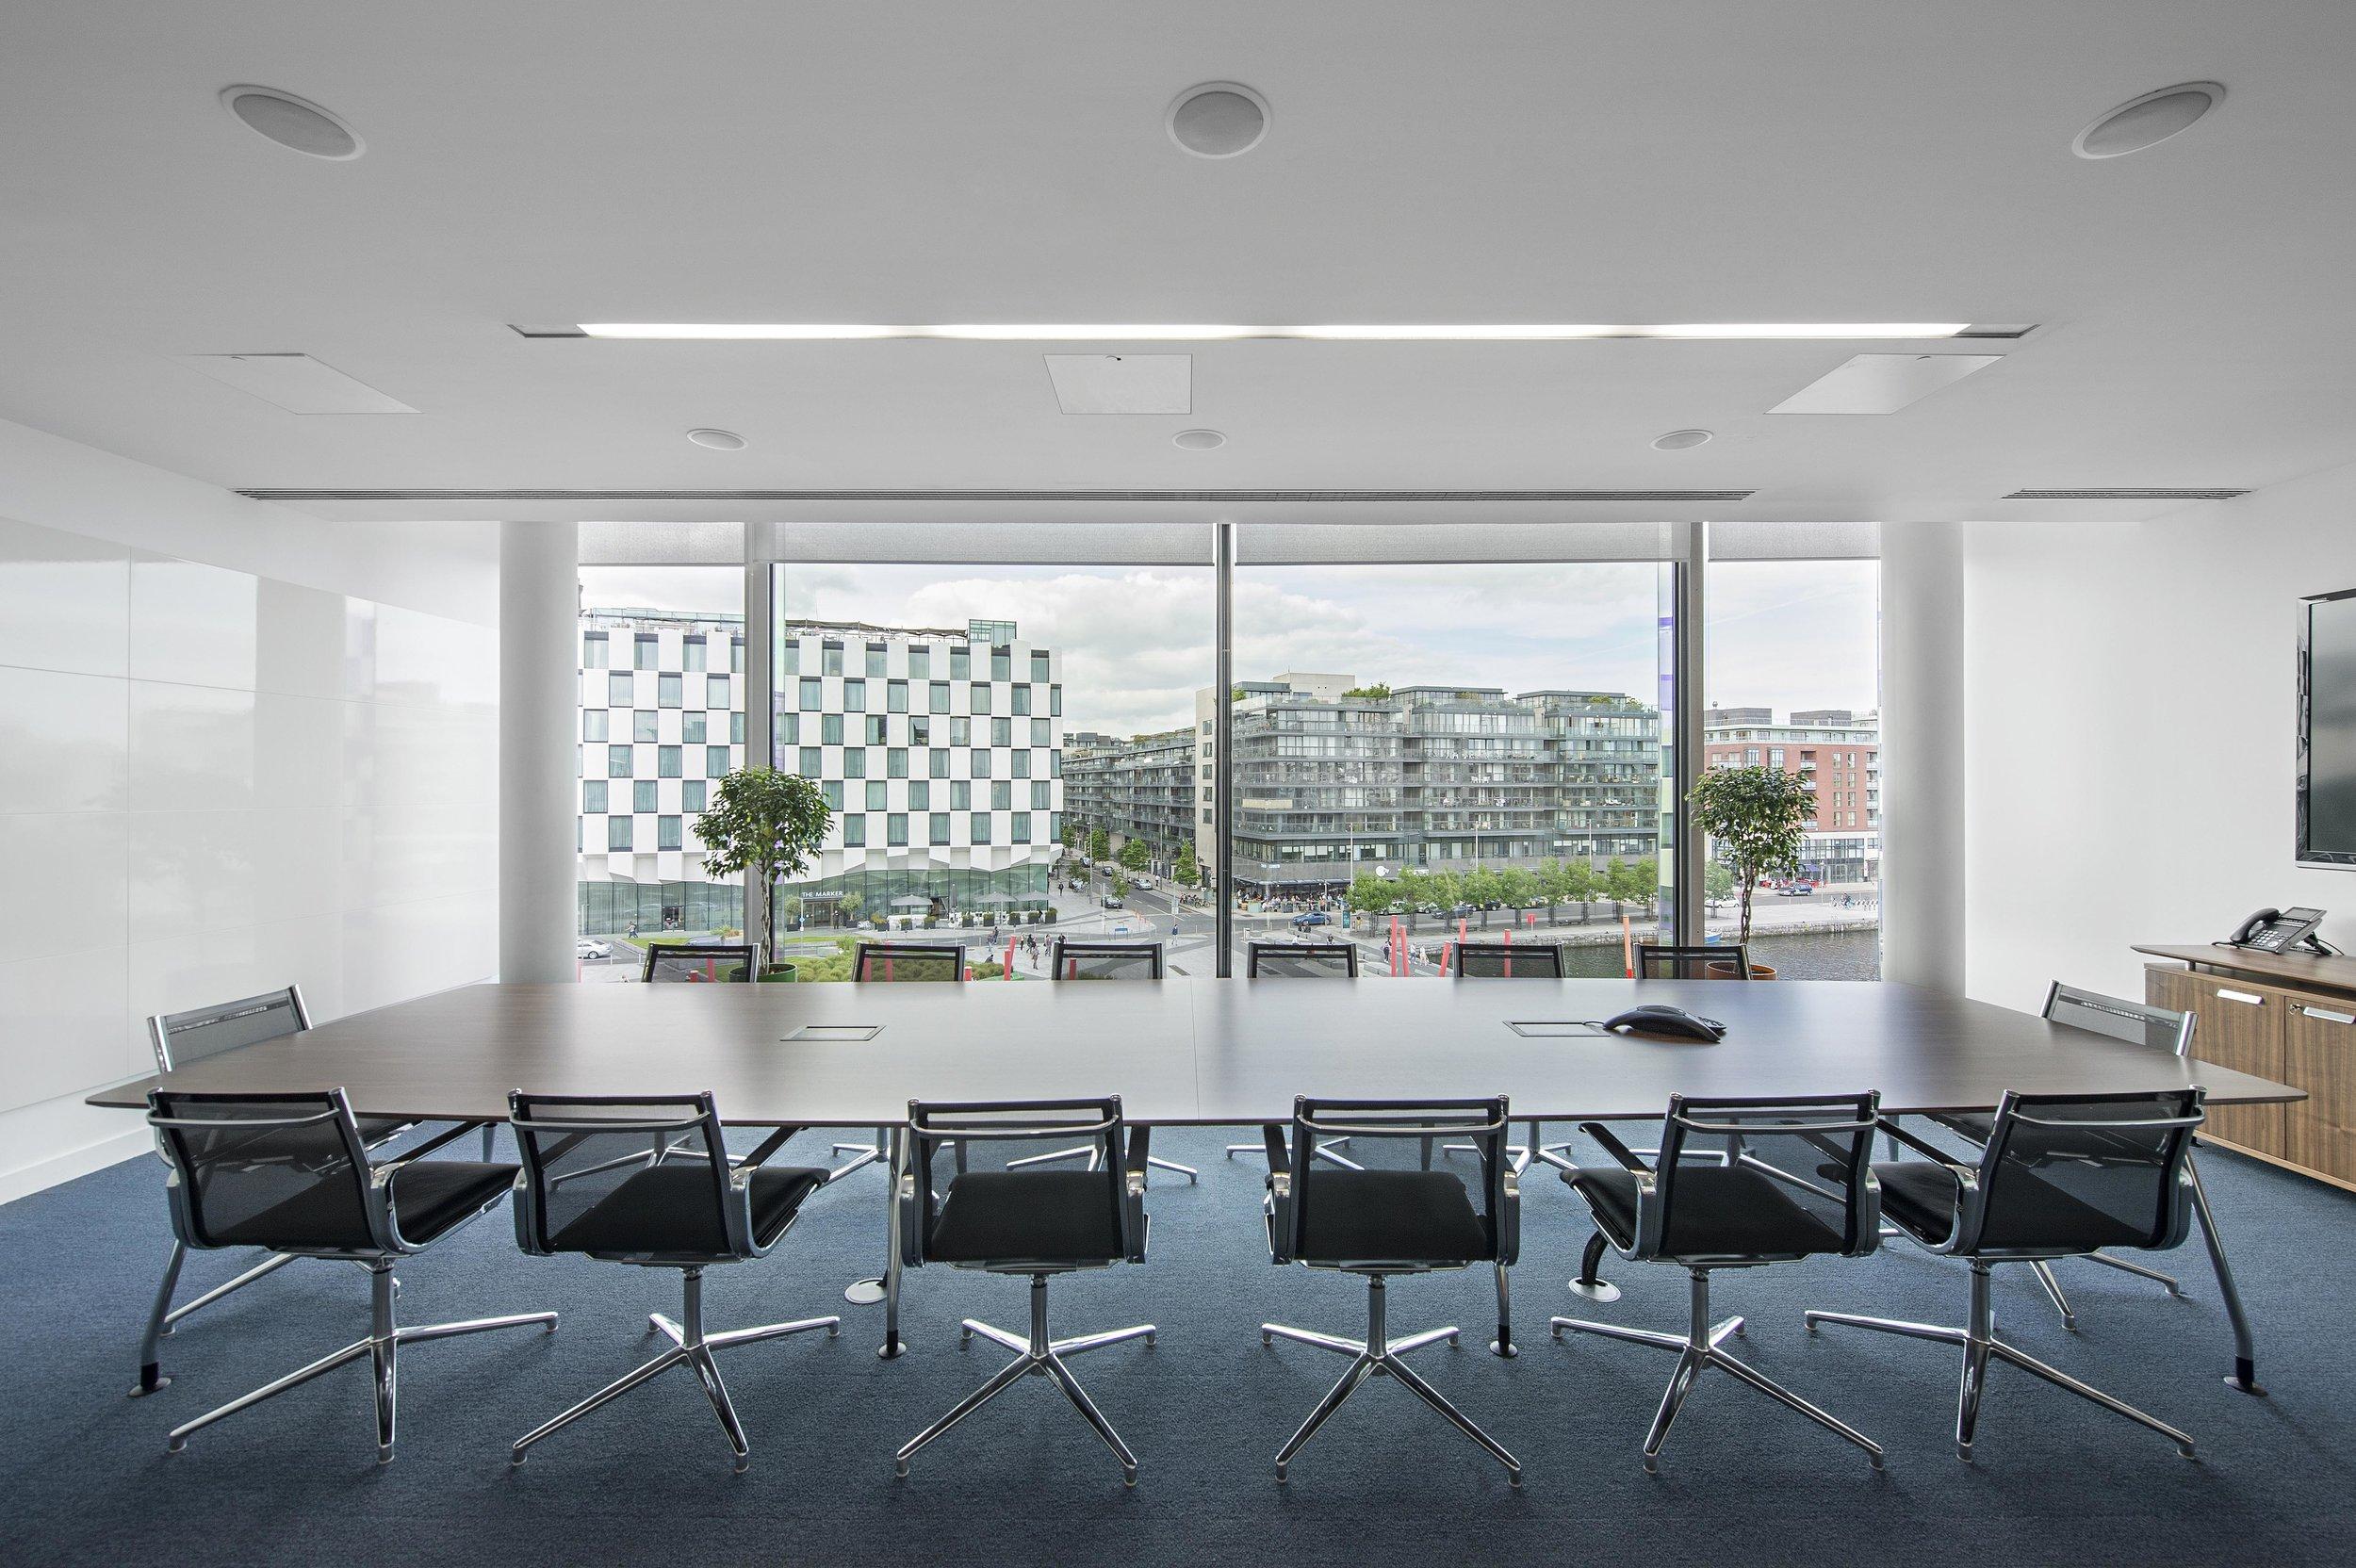 IPB_Meeting_Room.jpg